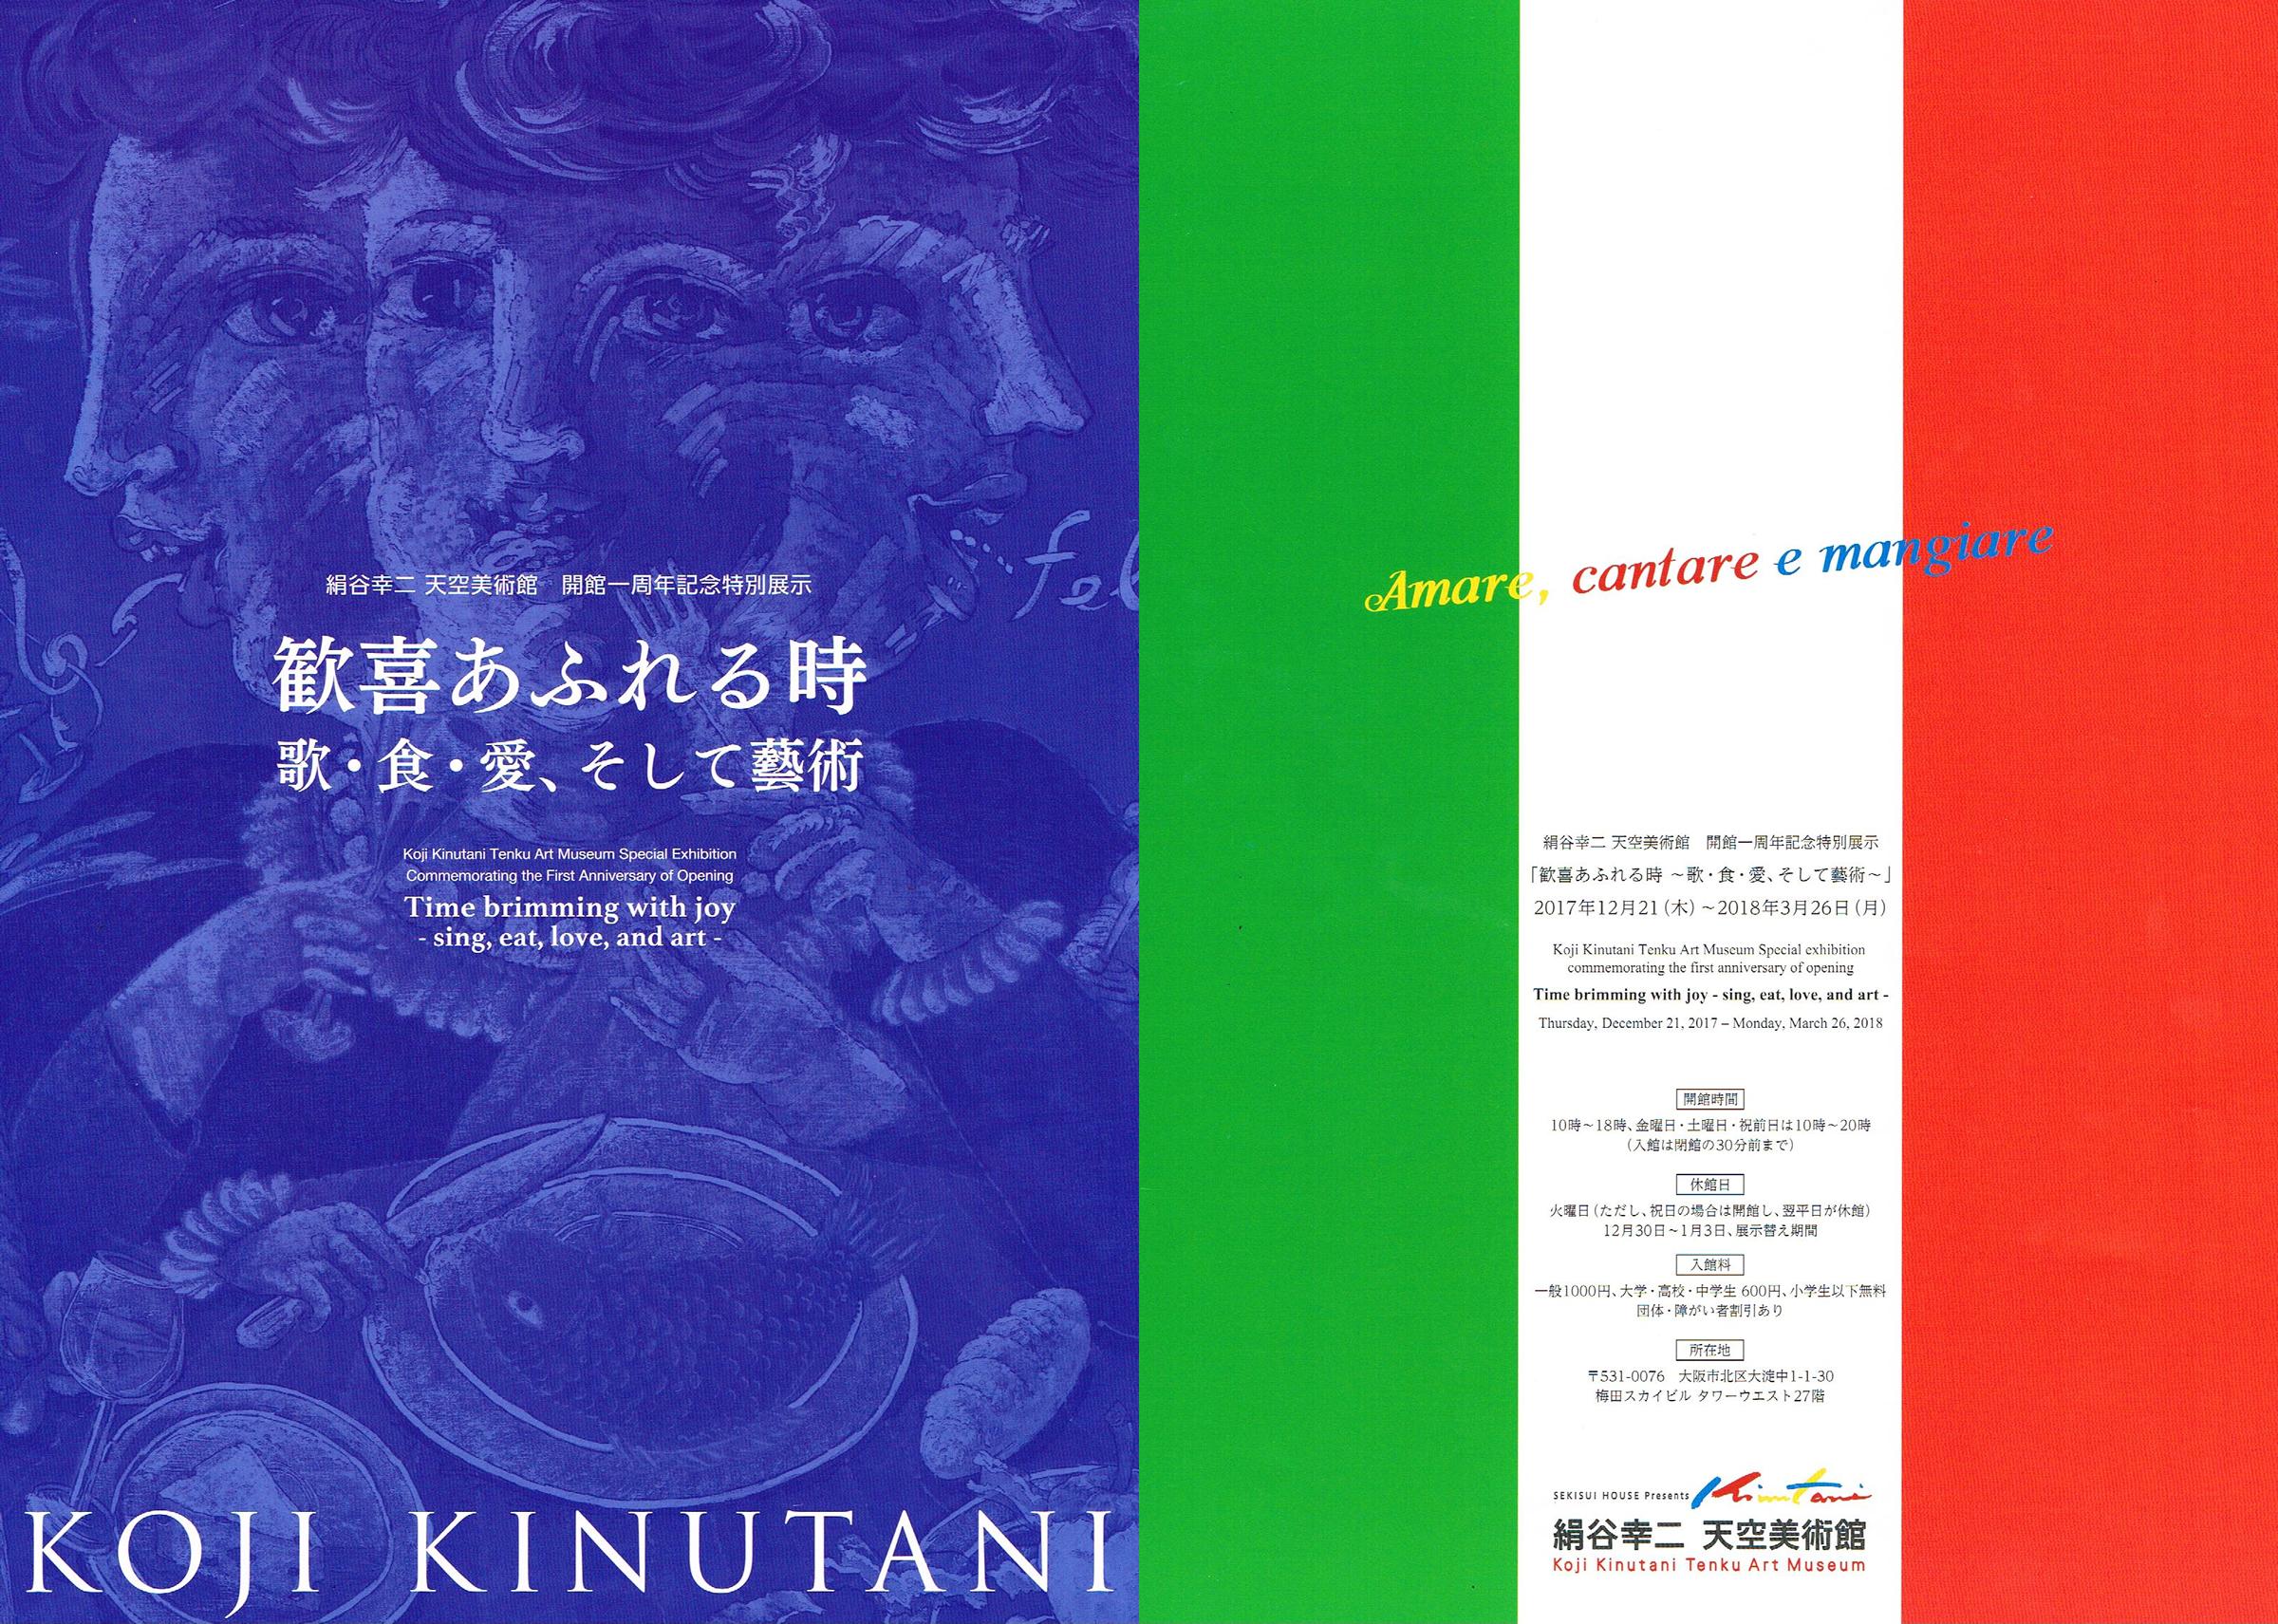 http://kinutani.jp/news/about/2017122101.jpg